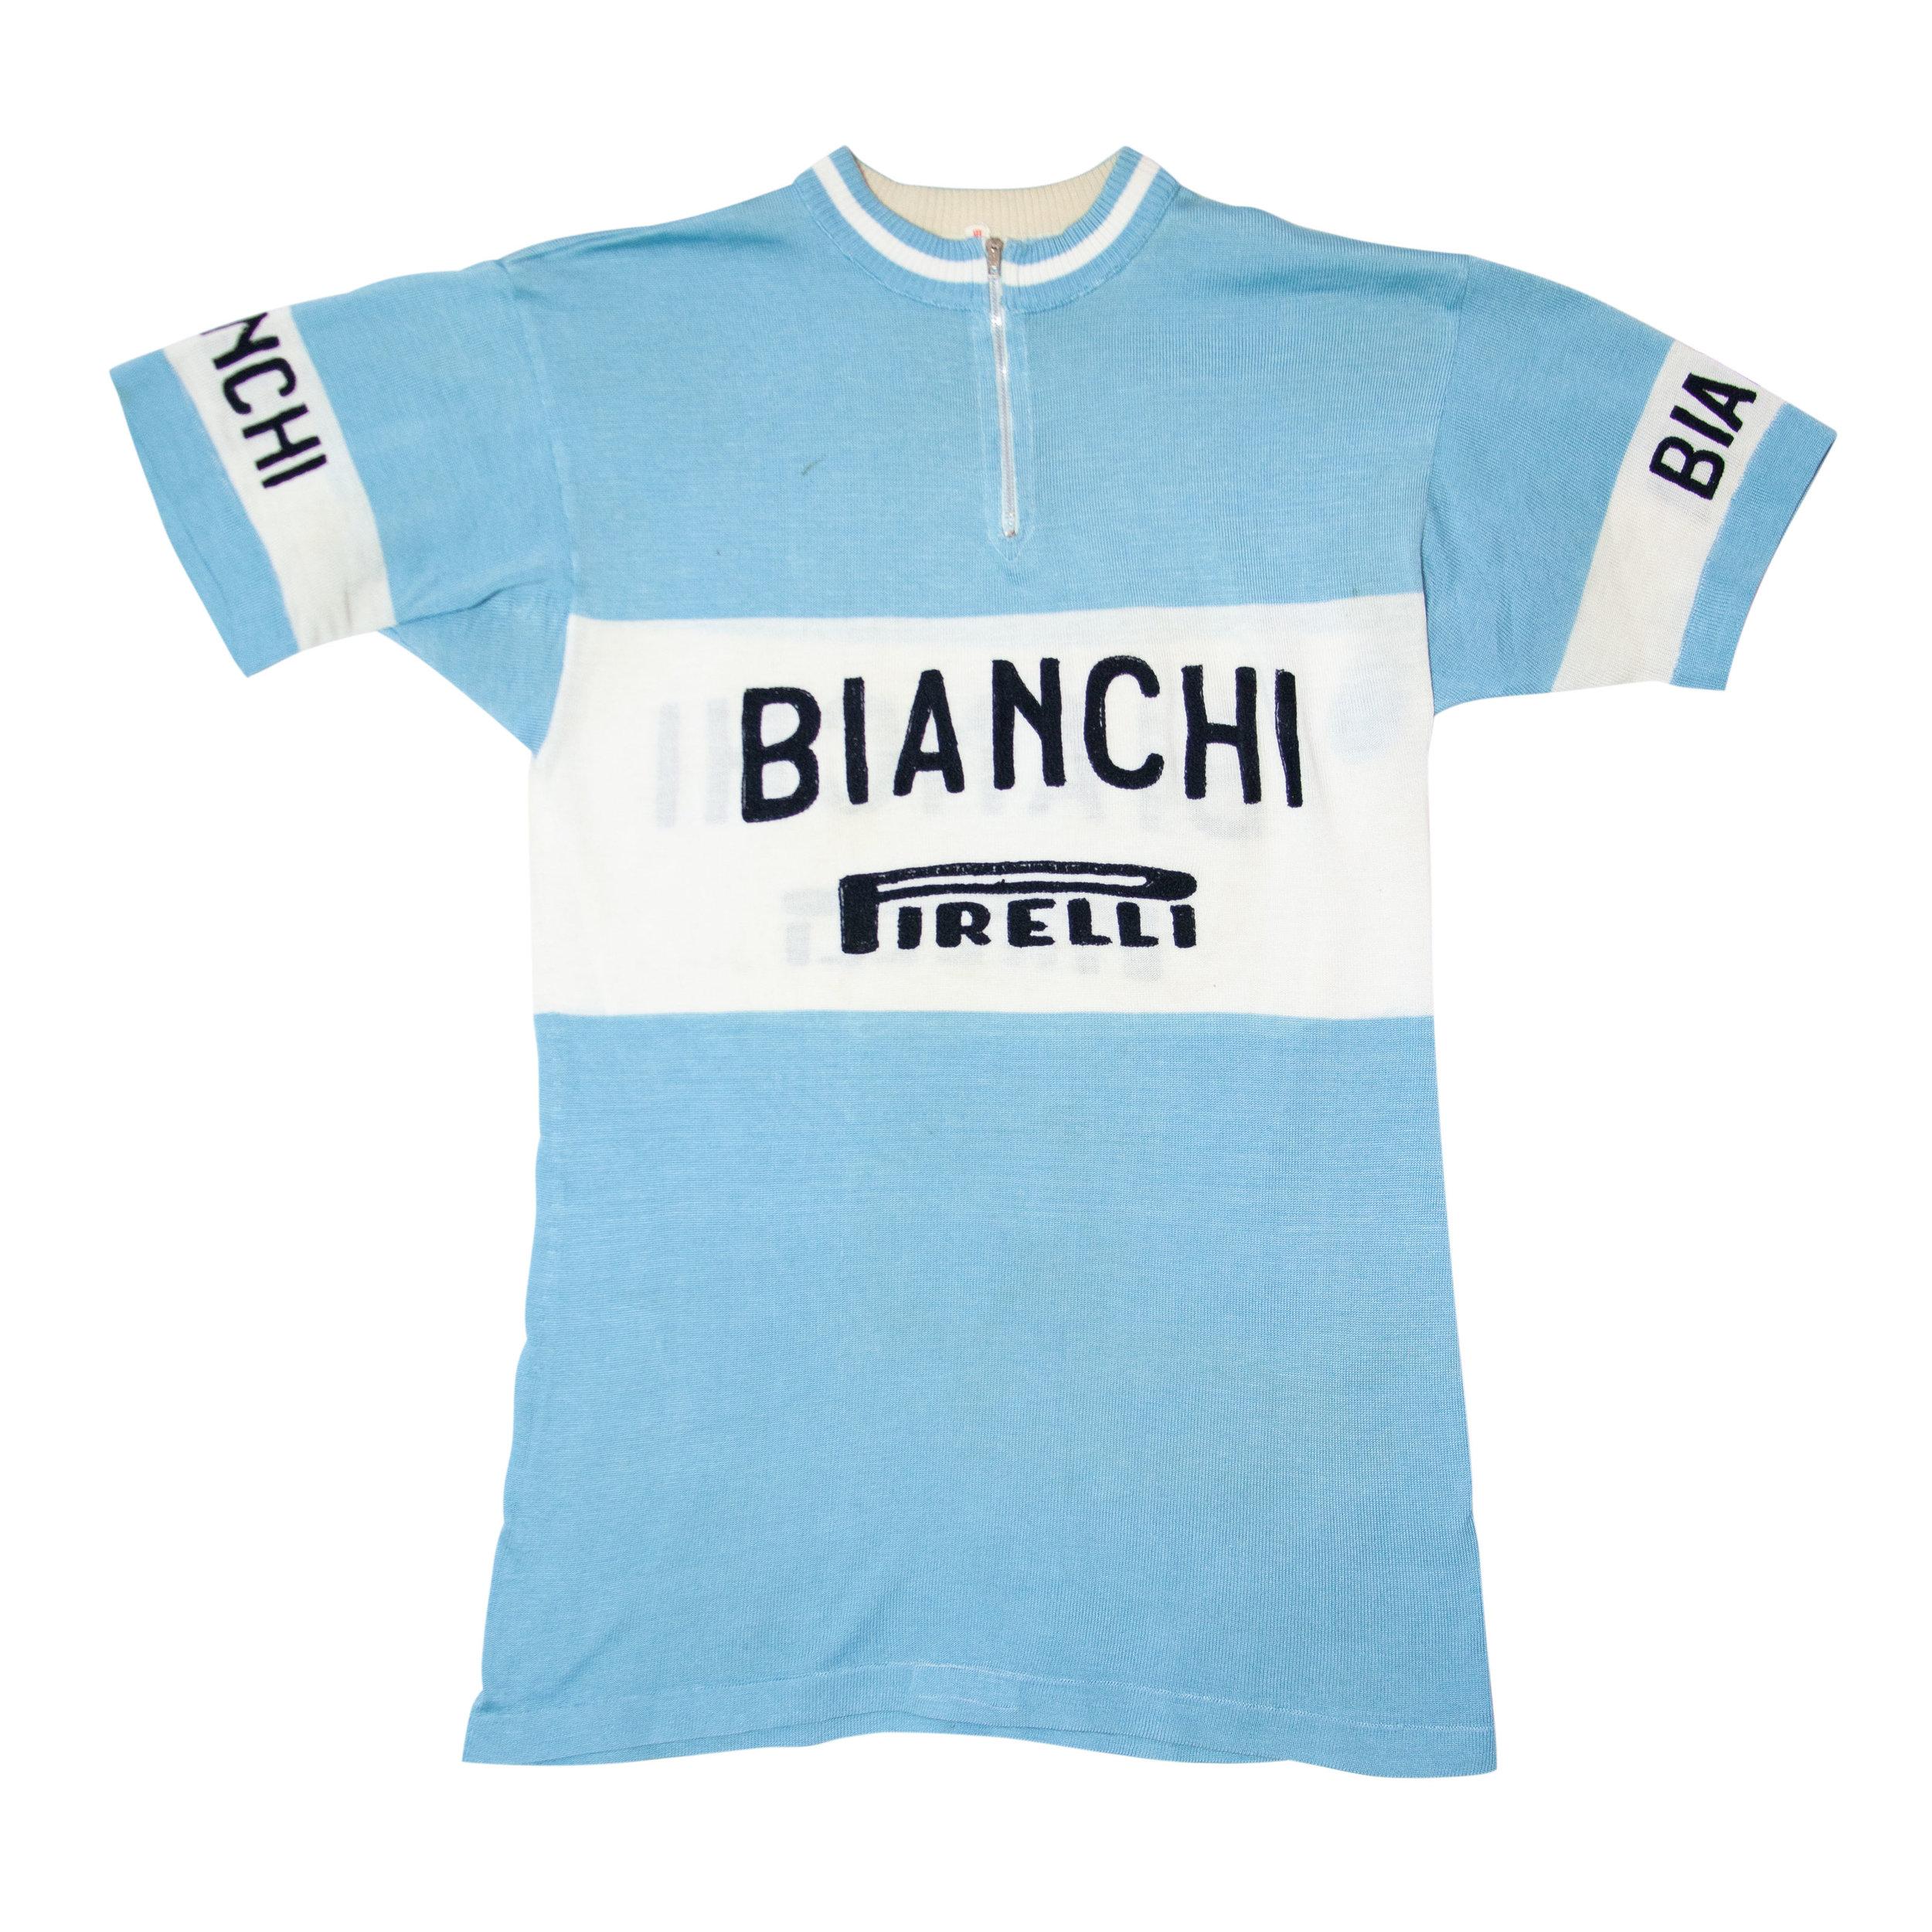 1958 - Bianchi-Pirelli.jpg